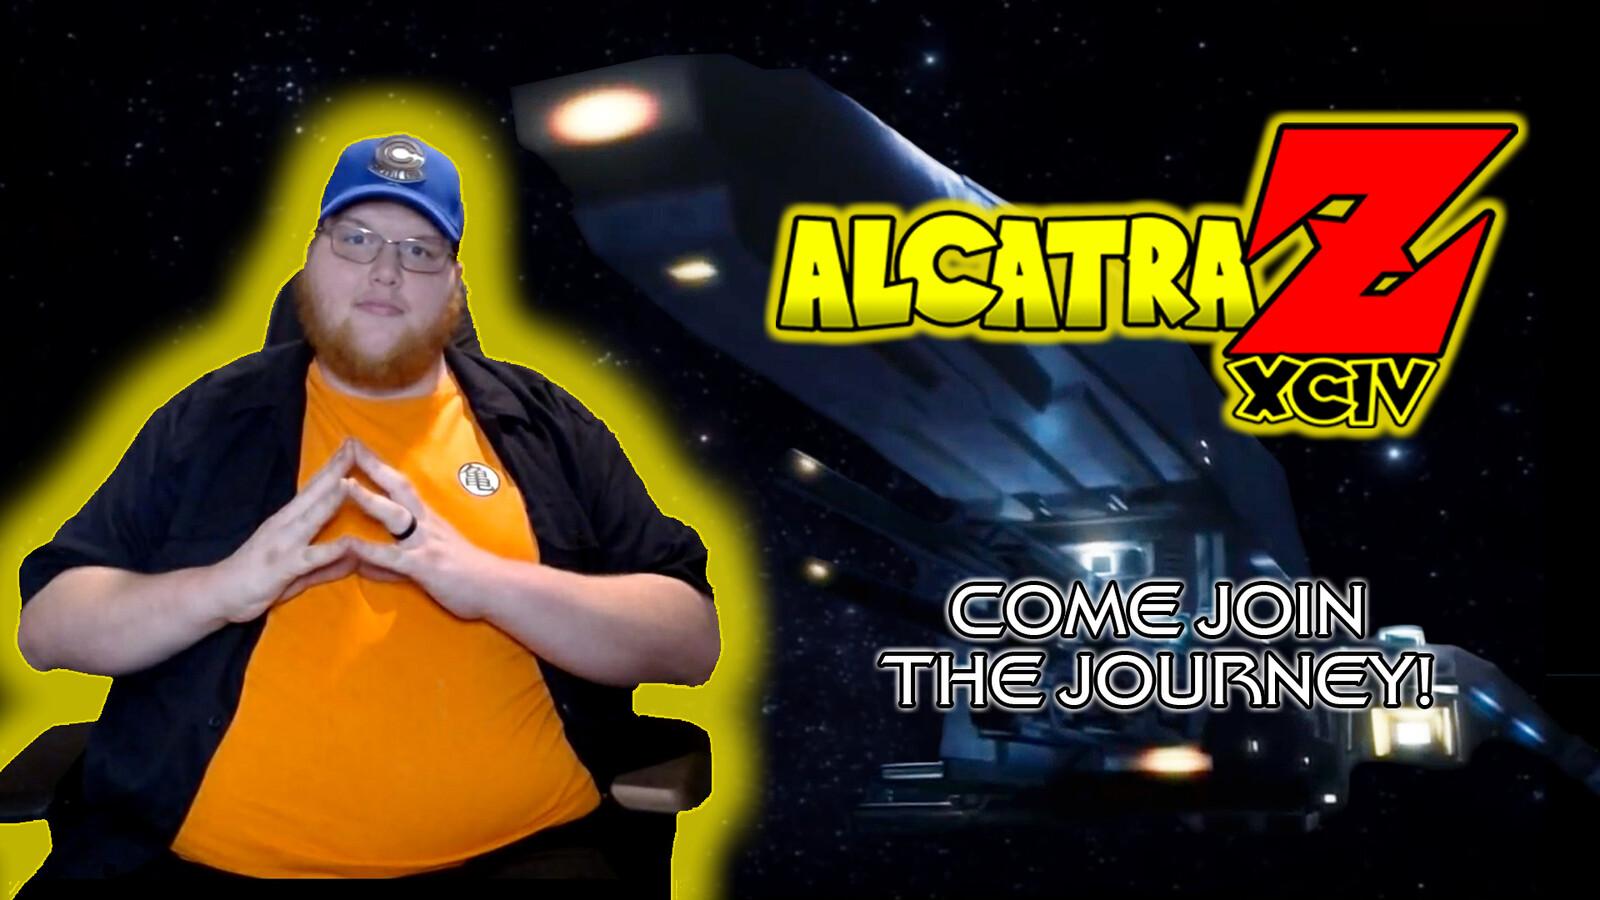 AlcatrazXCIV Social Media Post #1